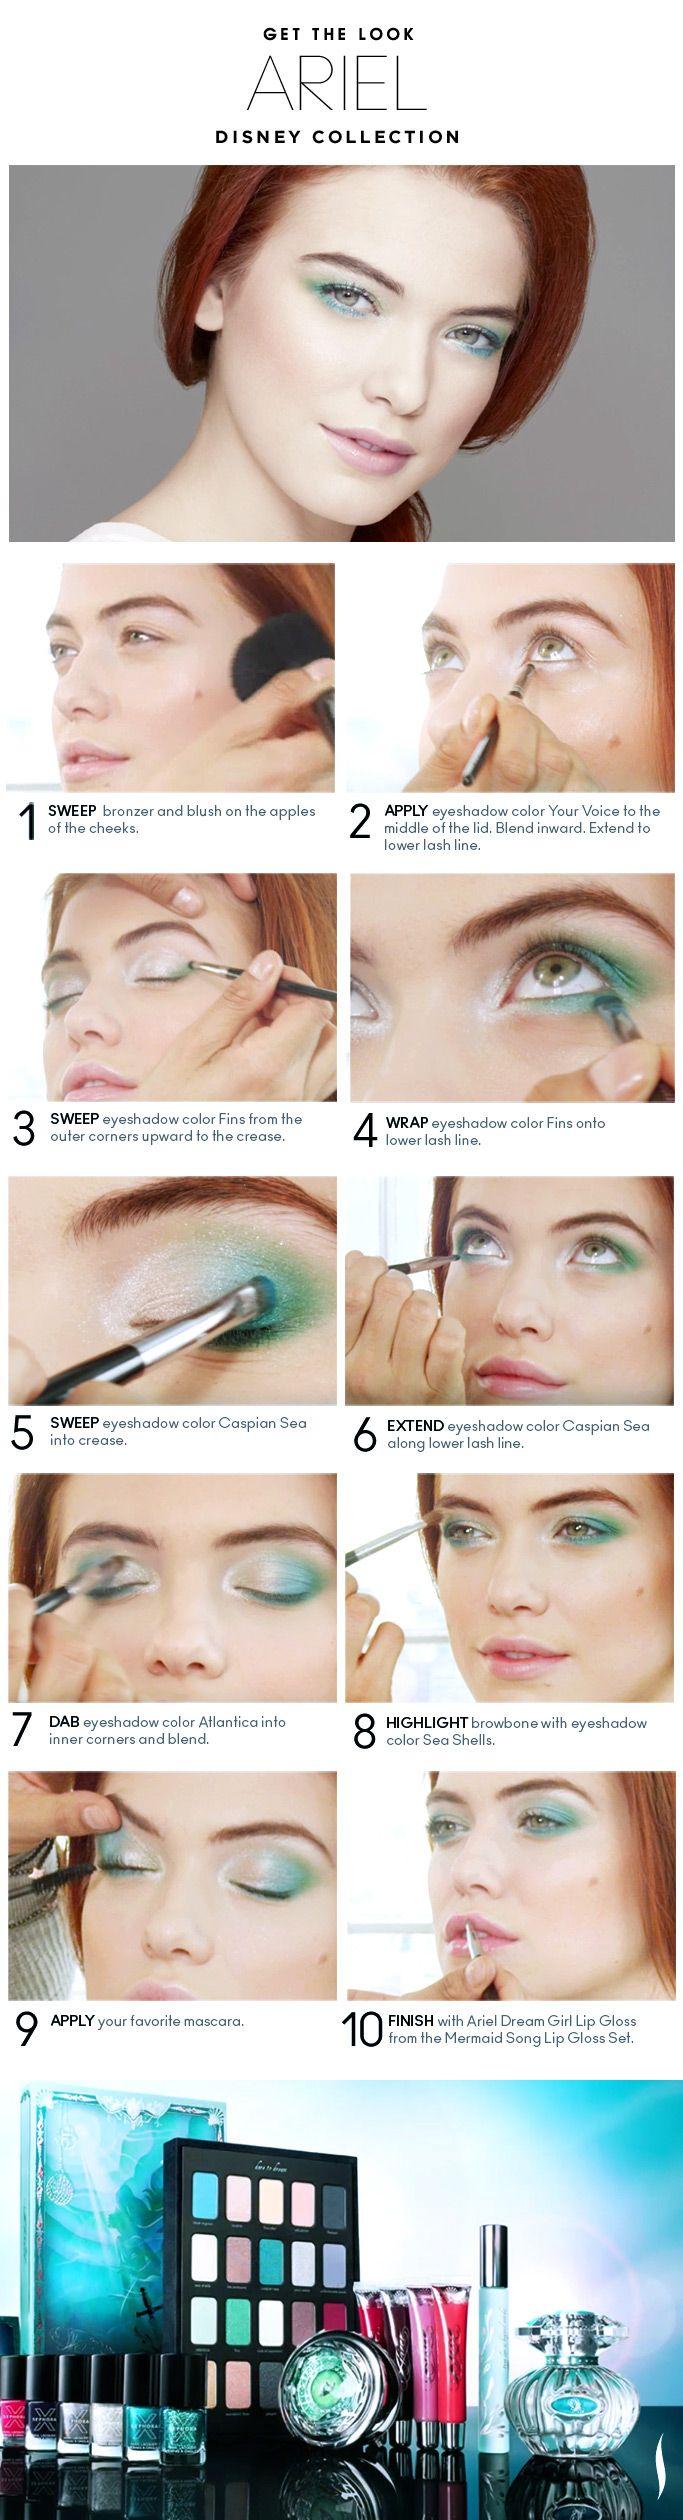 Beauty How To: The Disney Ariel Look #Sephora #makeup #makeuptutorial